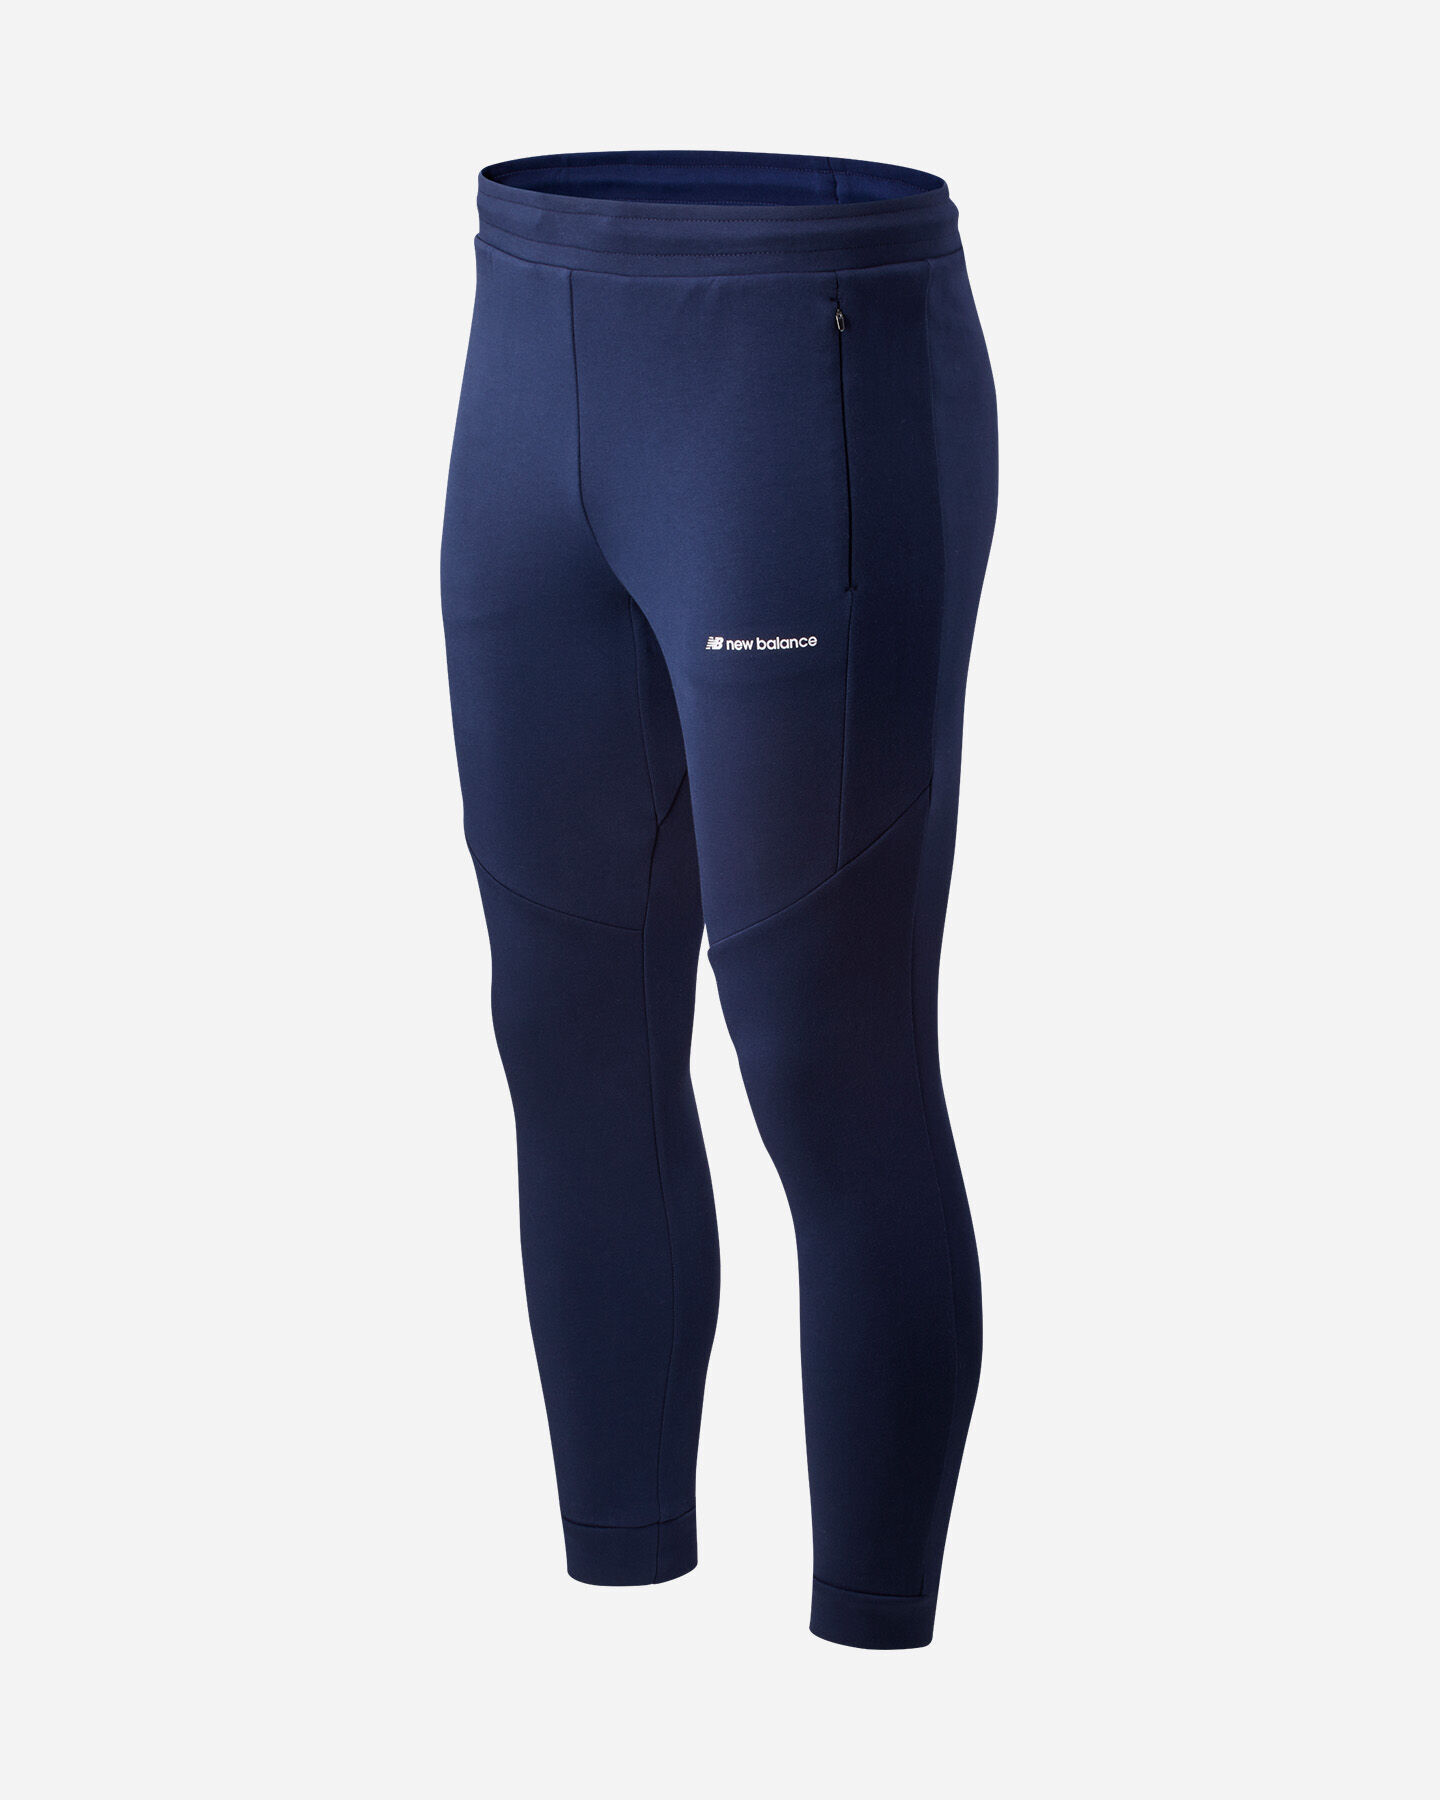 Pantalone NEW BALANCE CORE SLIM M S5166132 scatto 4